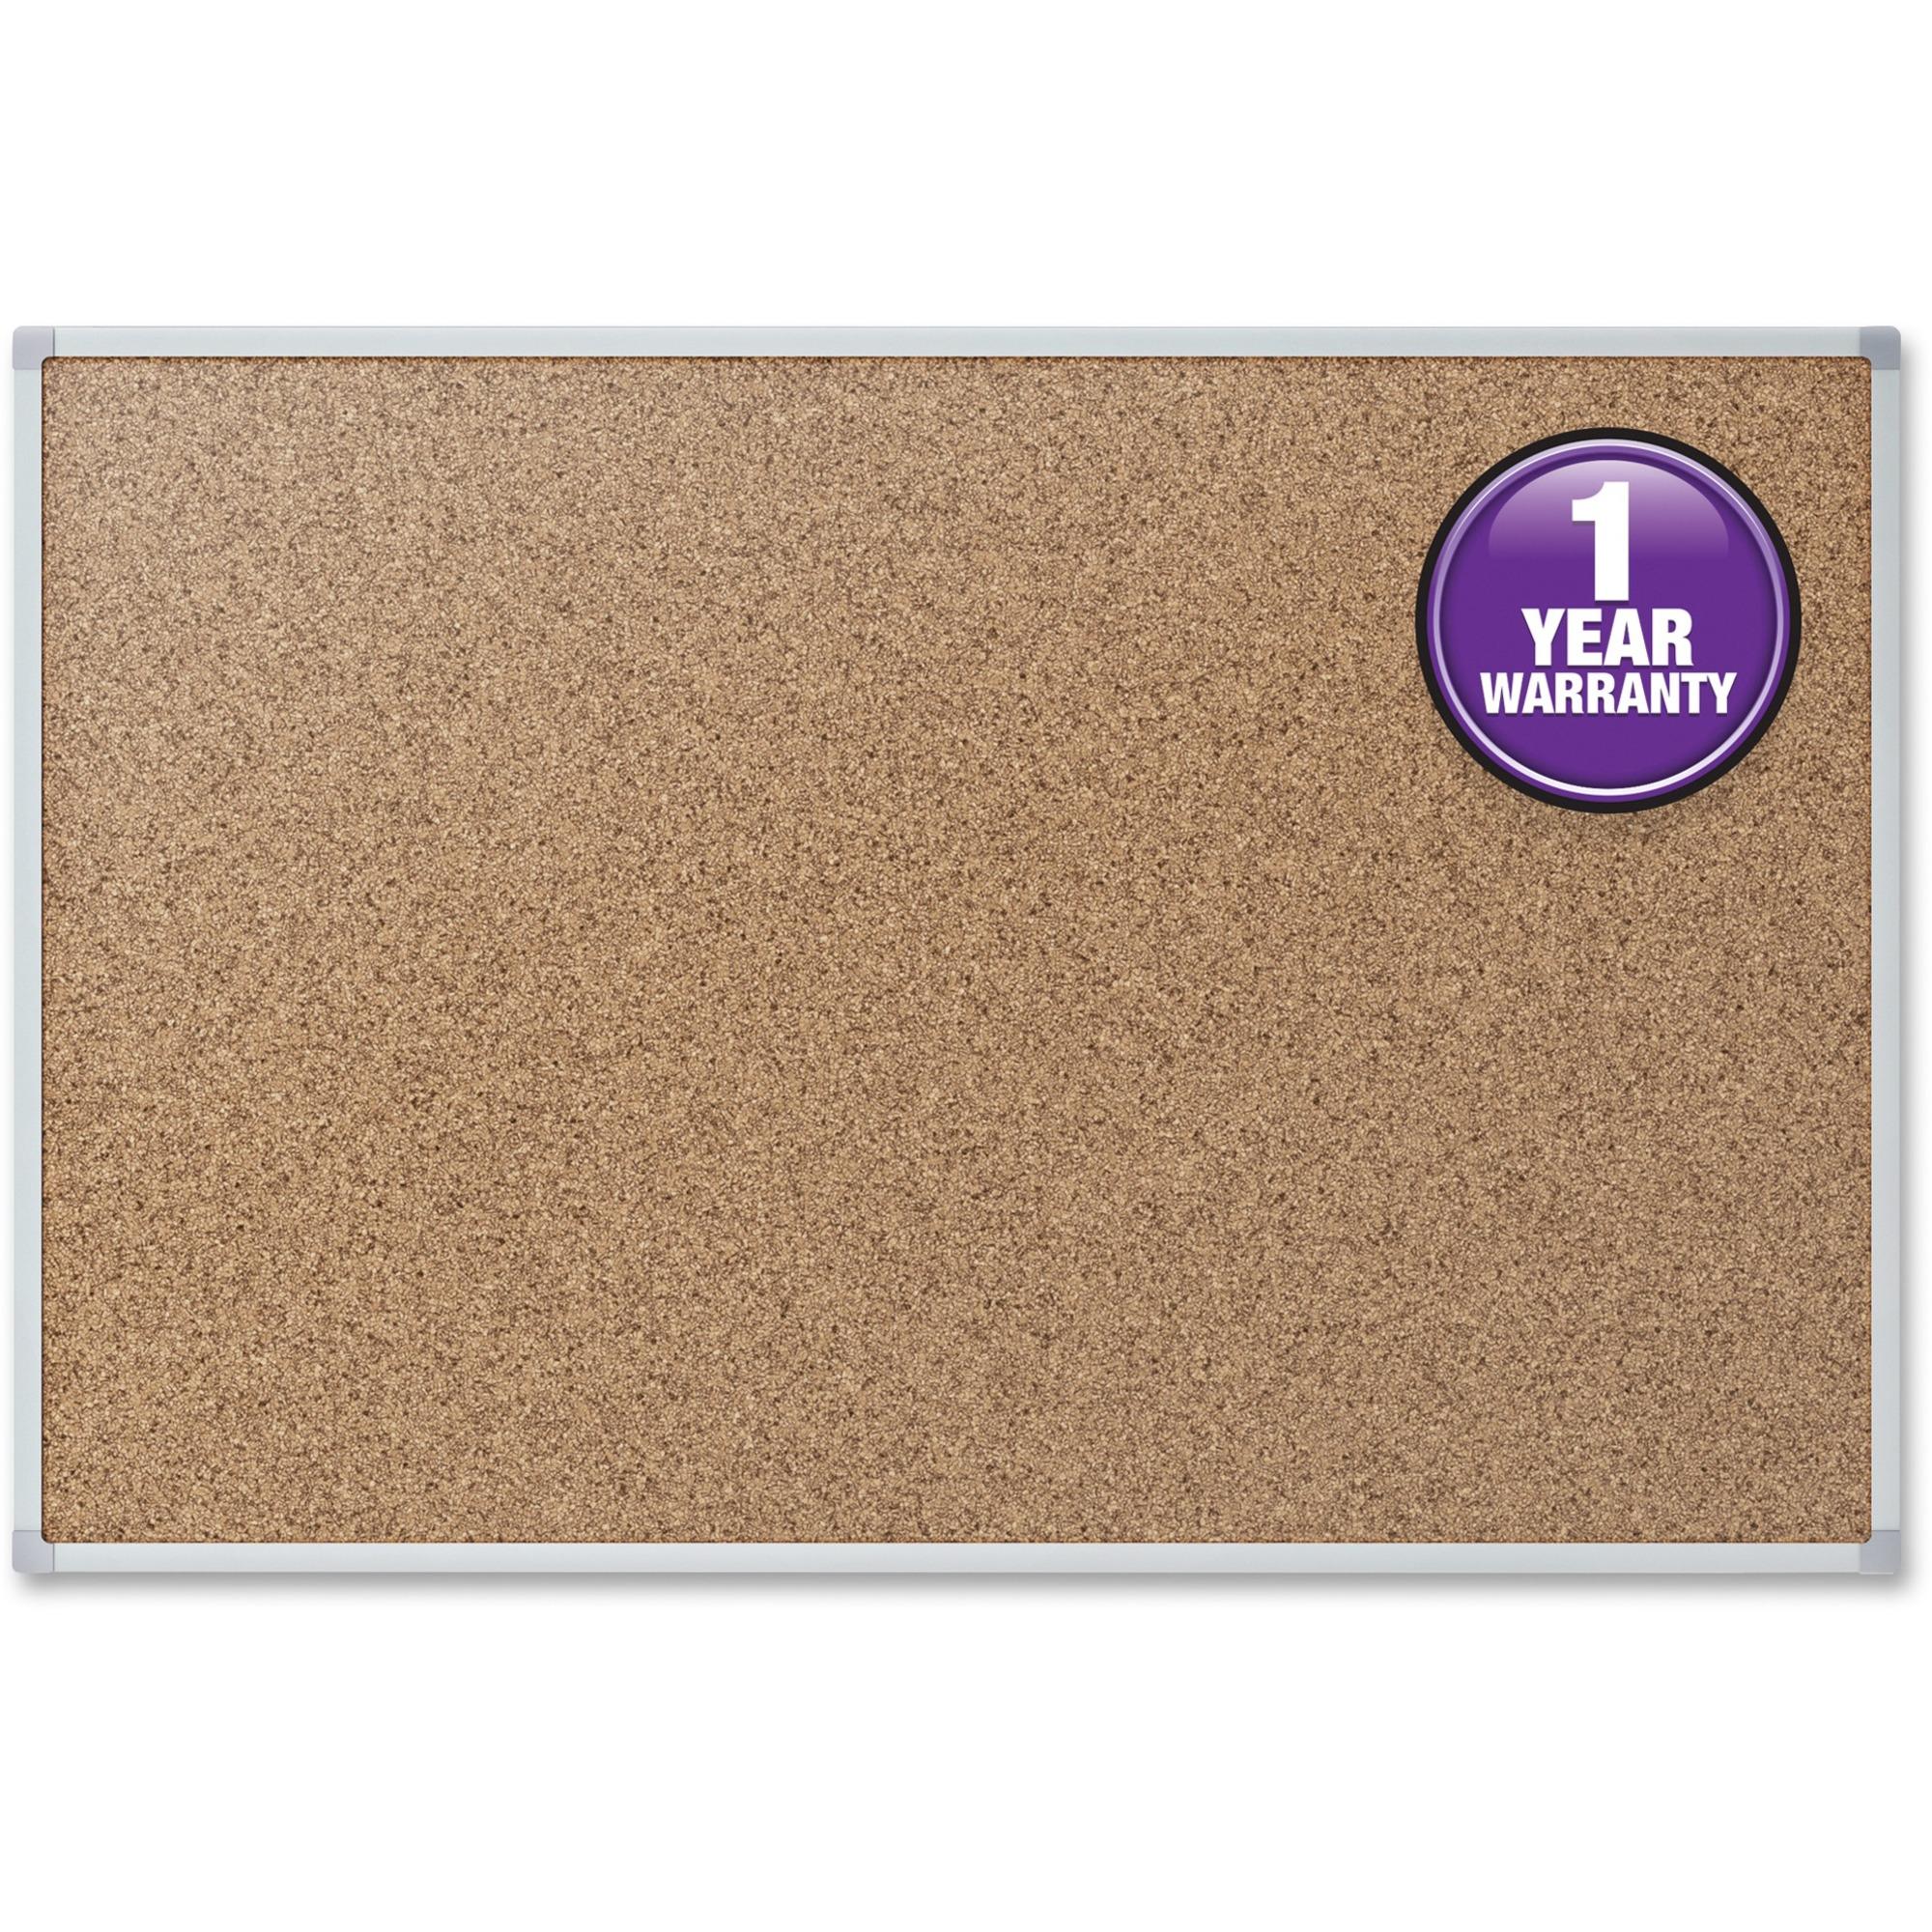 Acco Brands Corporation Mead Cork Surface Bulletin Board - 24 Height X 36 Width - Natural Cork Surface - Self-healing - Silver Aluminum Frame - 1 Each